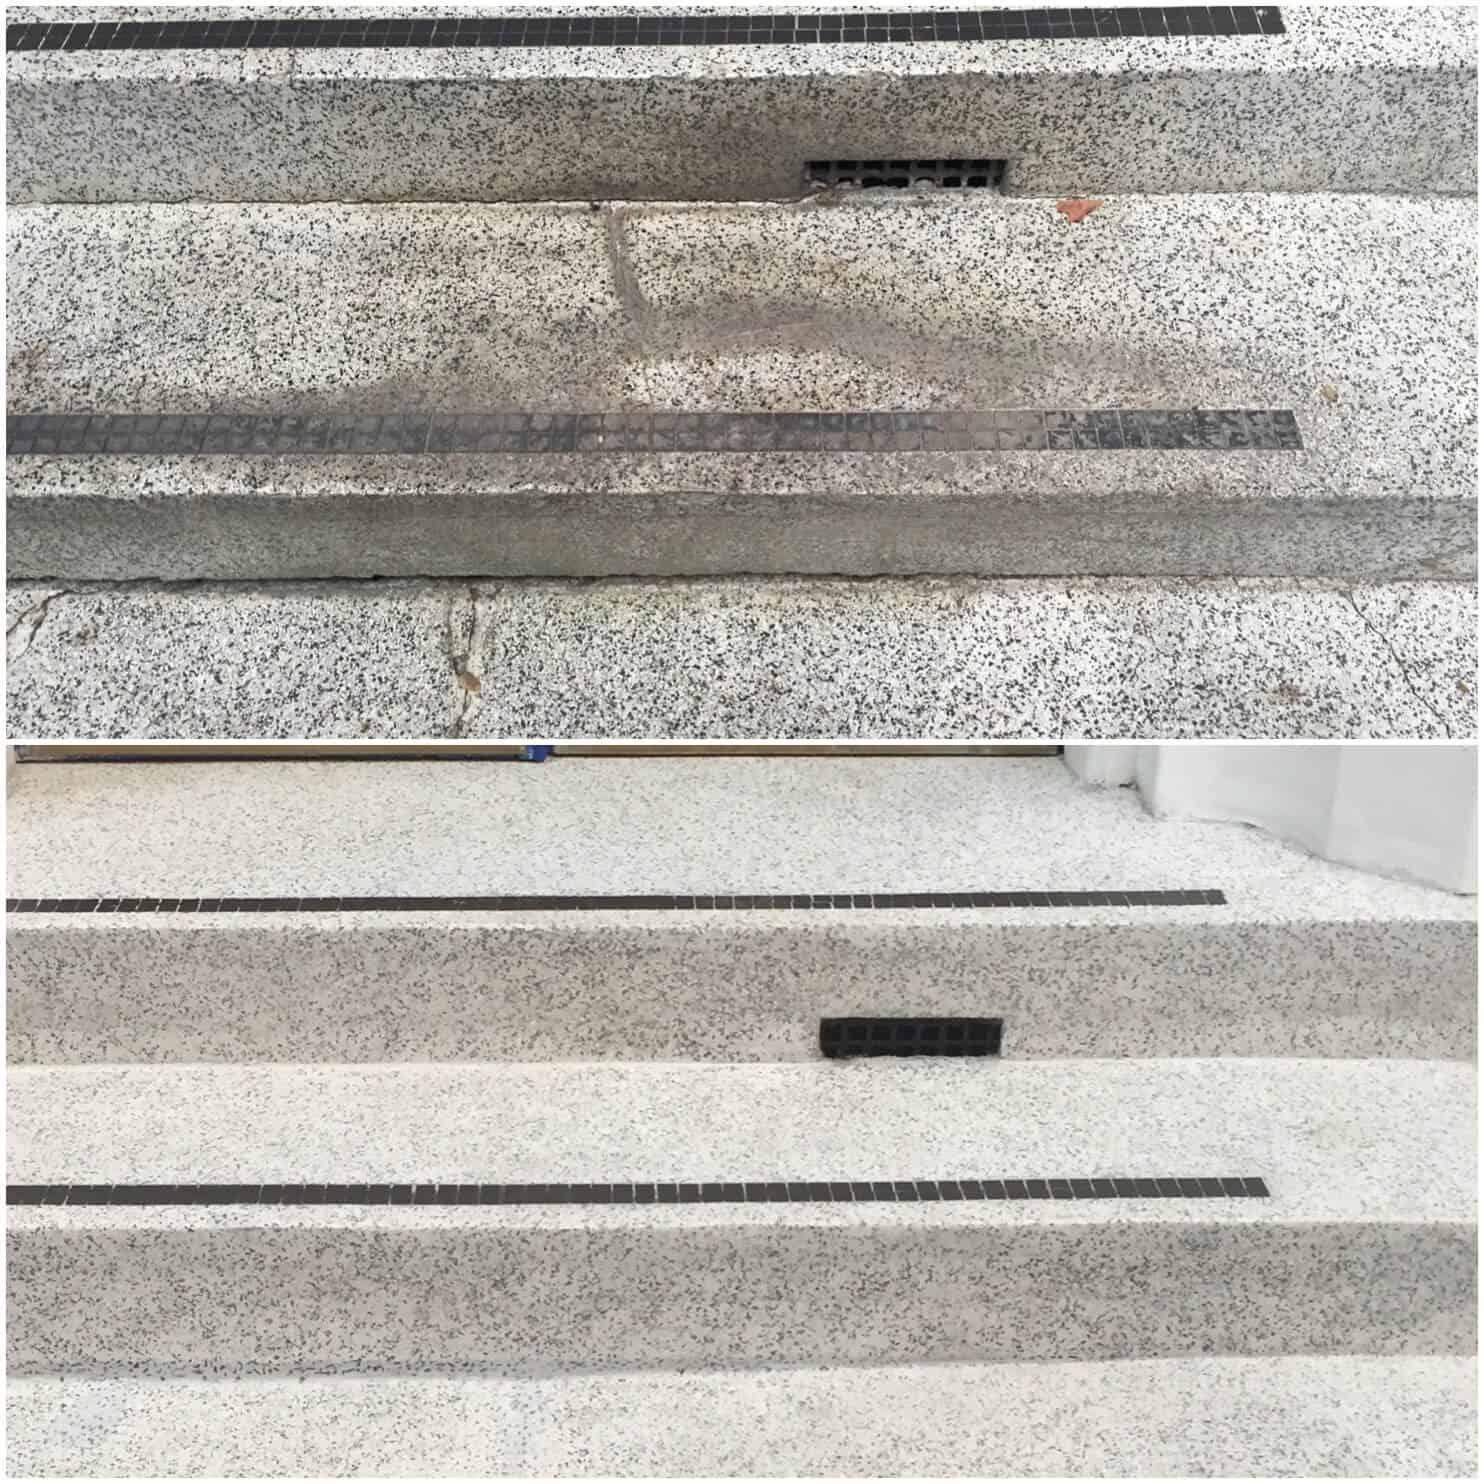 Terrazzo steps grinding